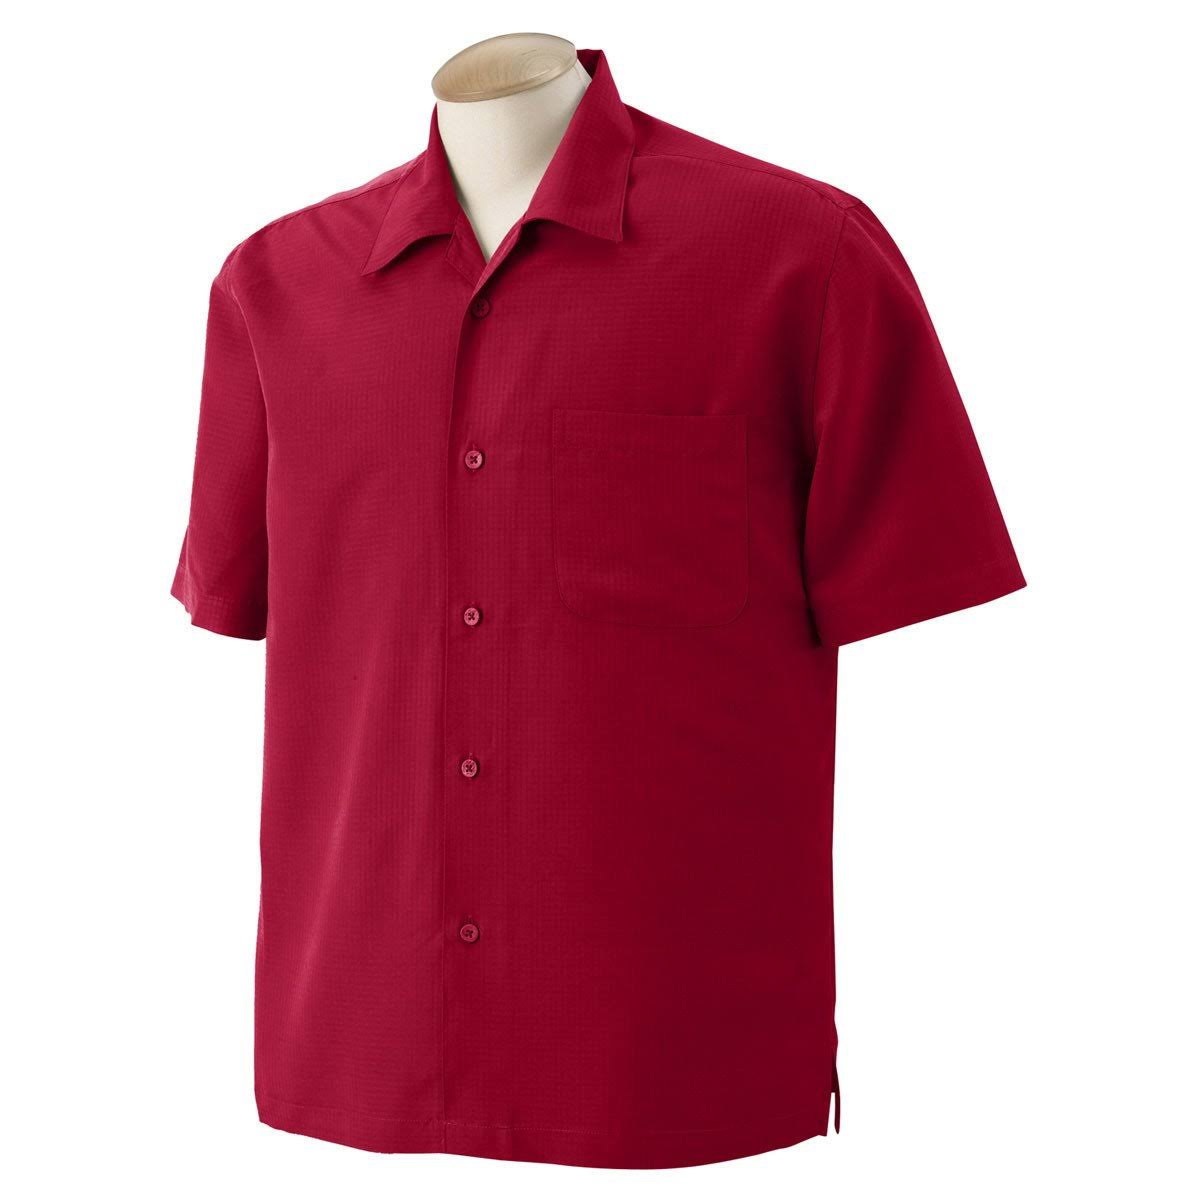 Red Herren Shirt Camp M560 Harriton Barbados Textured Parrot TqS1y0x